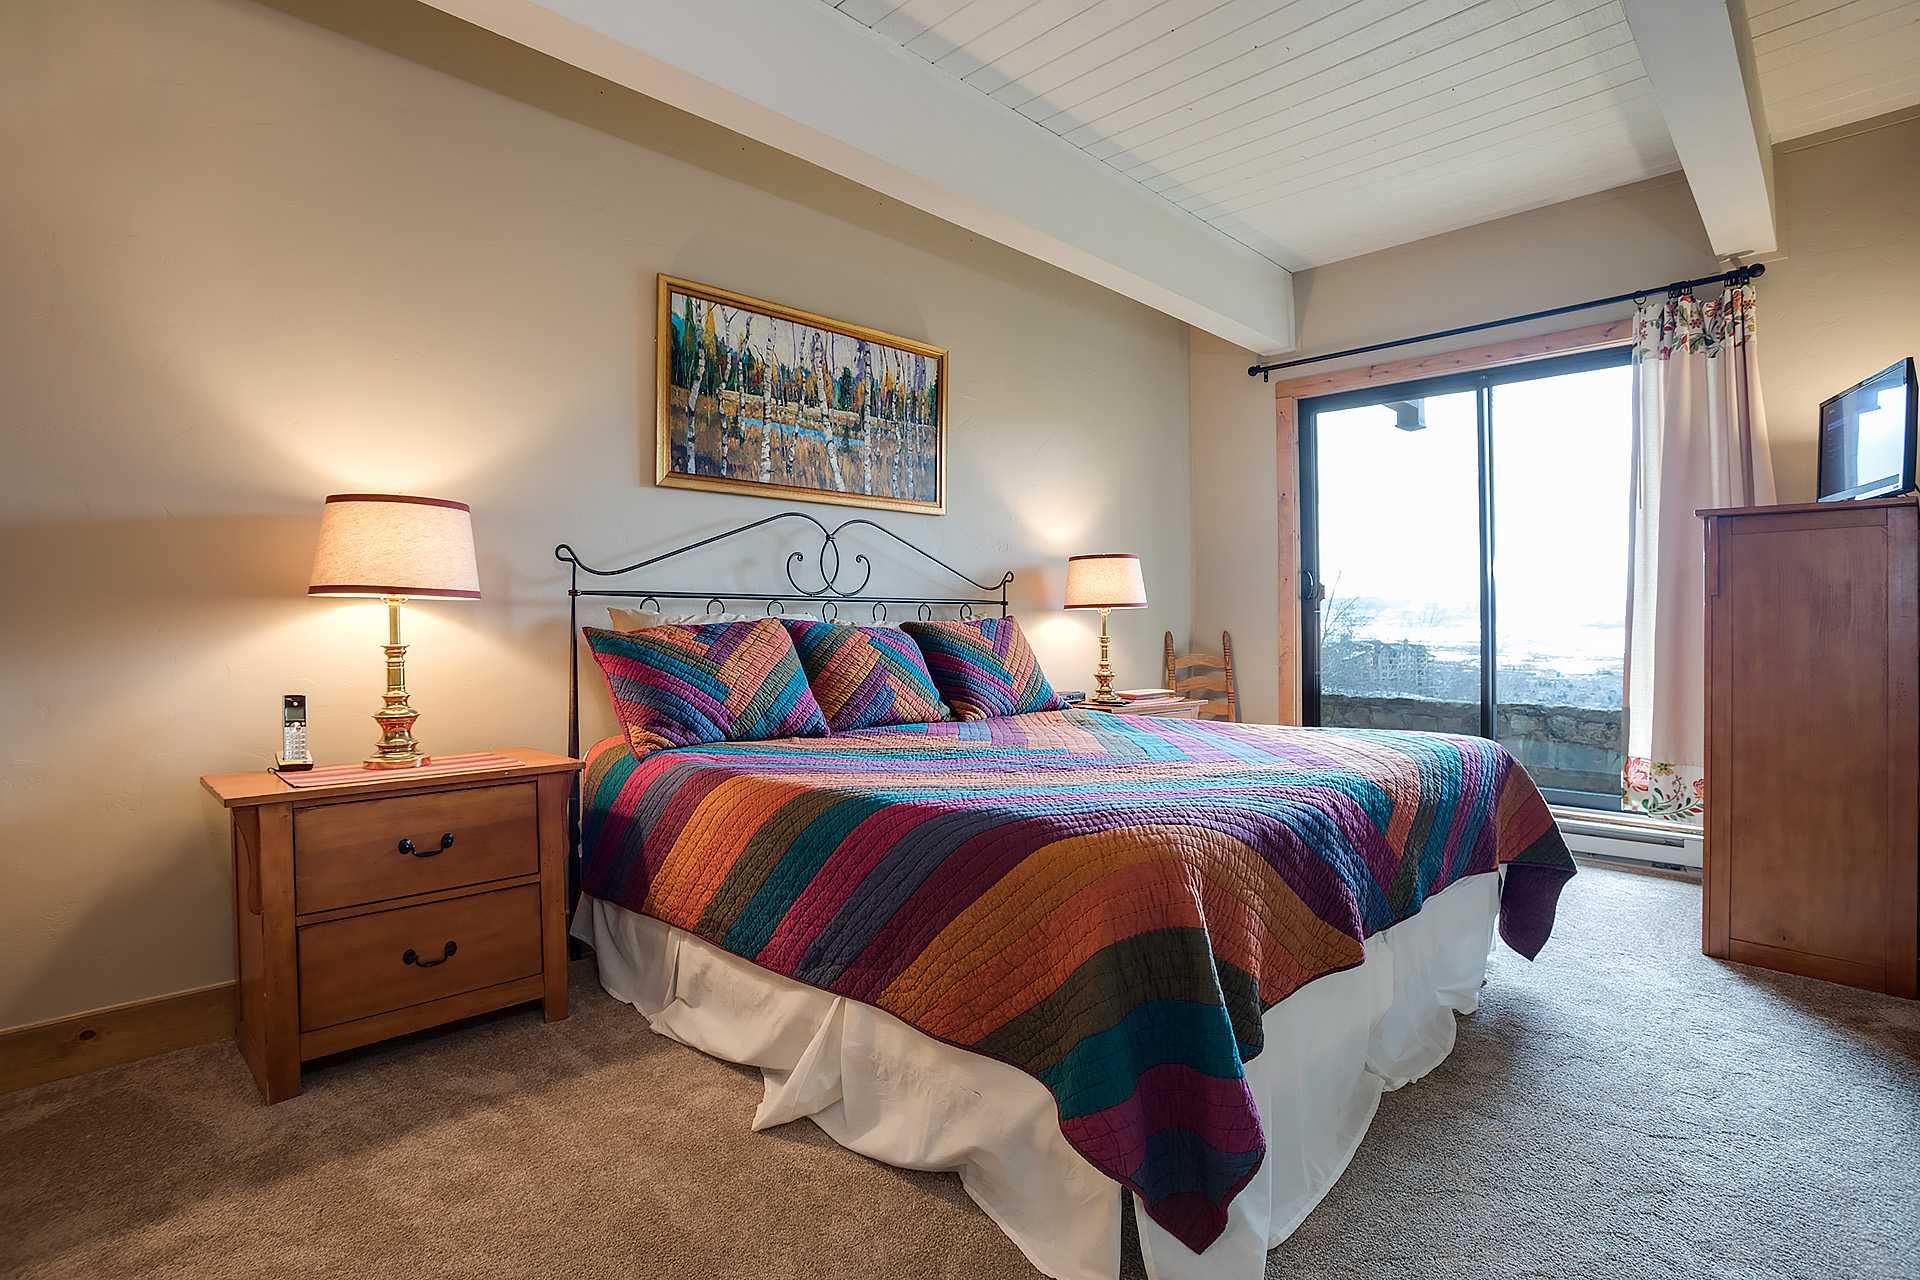 CA111: Storm Meadows Club A Condominiums